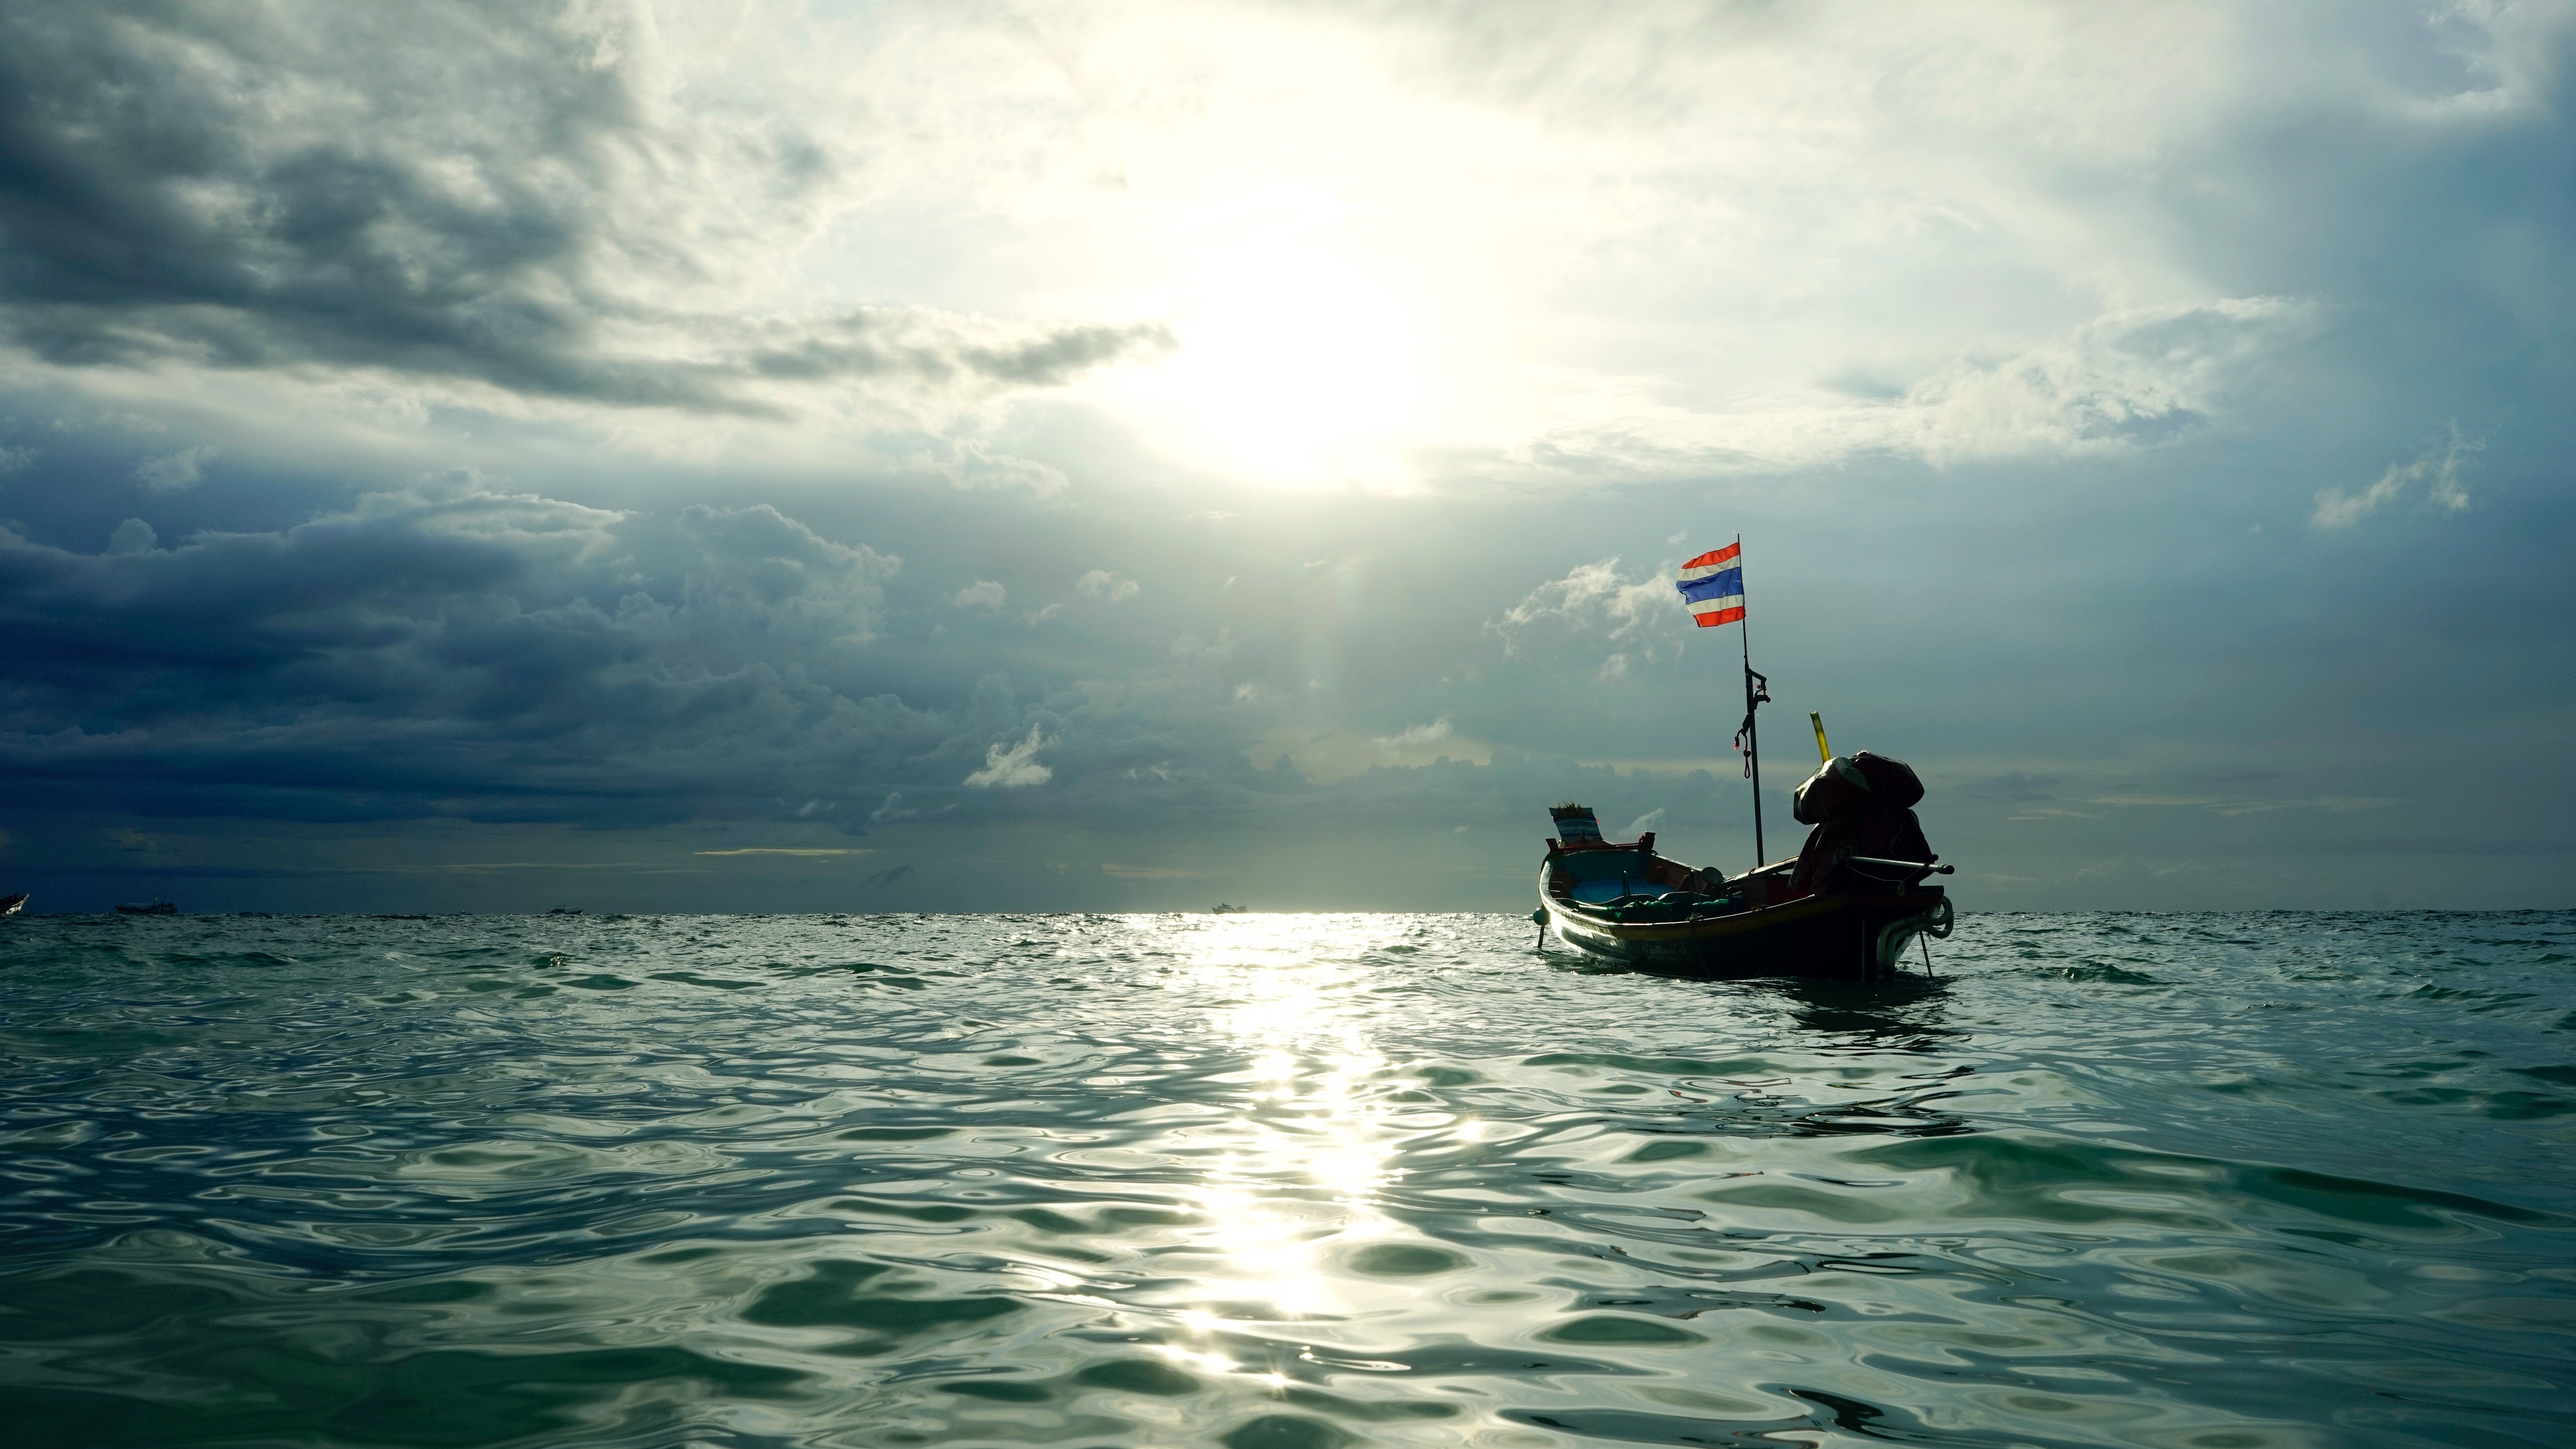 Floating boat wallpaper